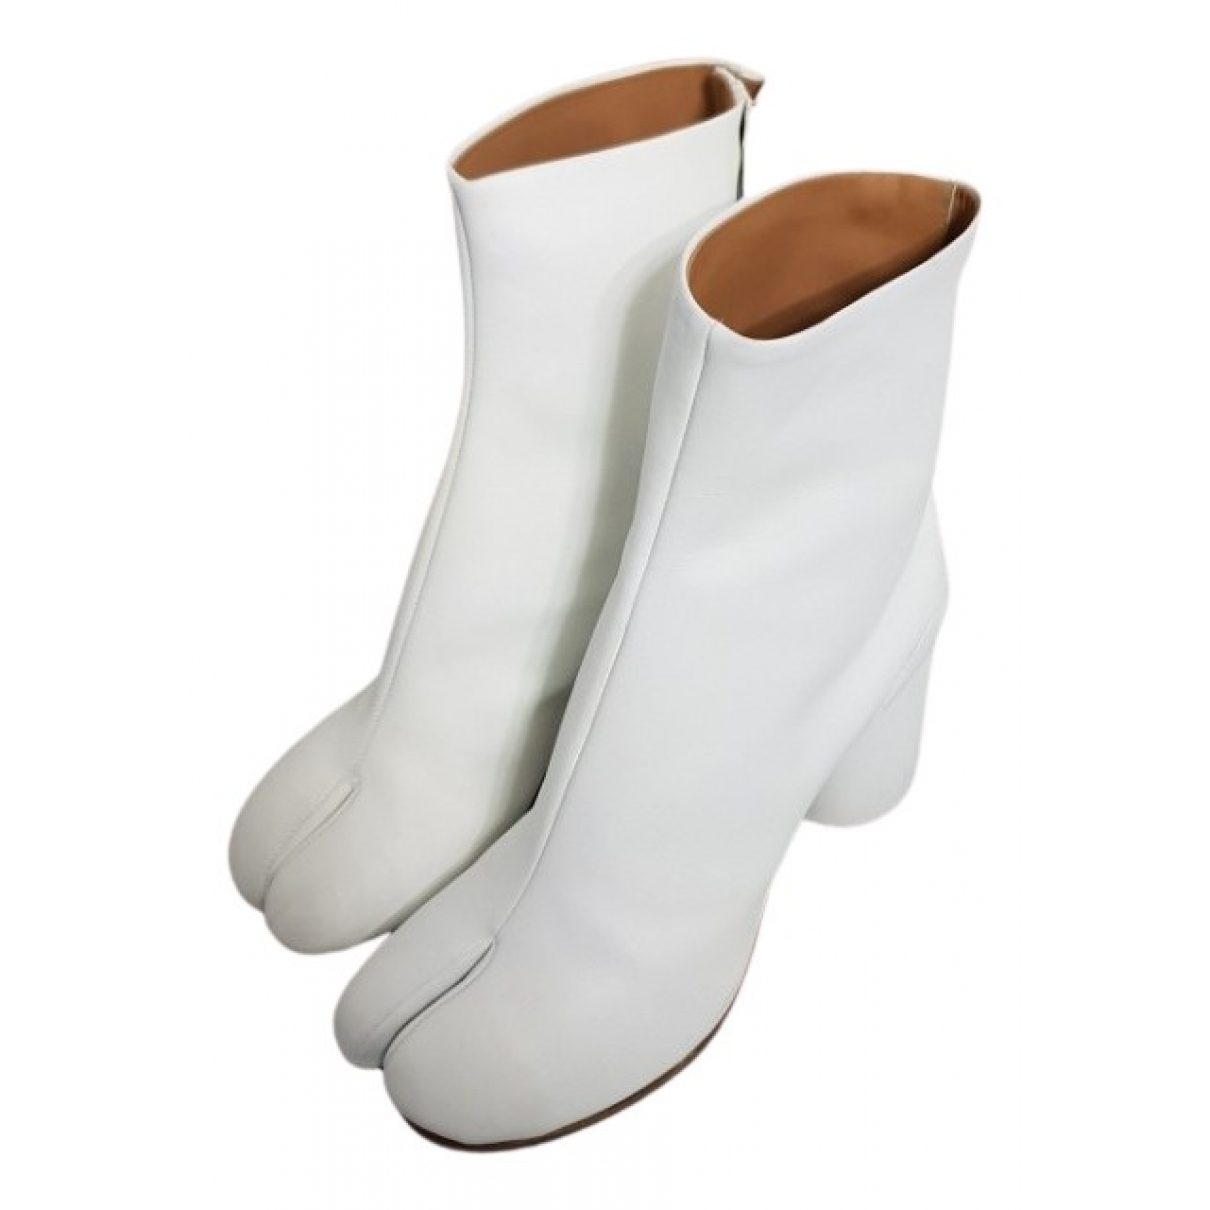 Maison Martin Margiela - Boots Tabi pour femme en cuir - blanc